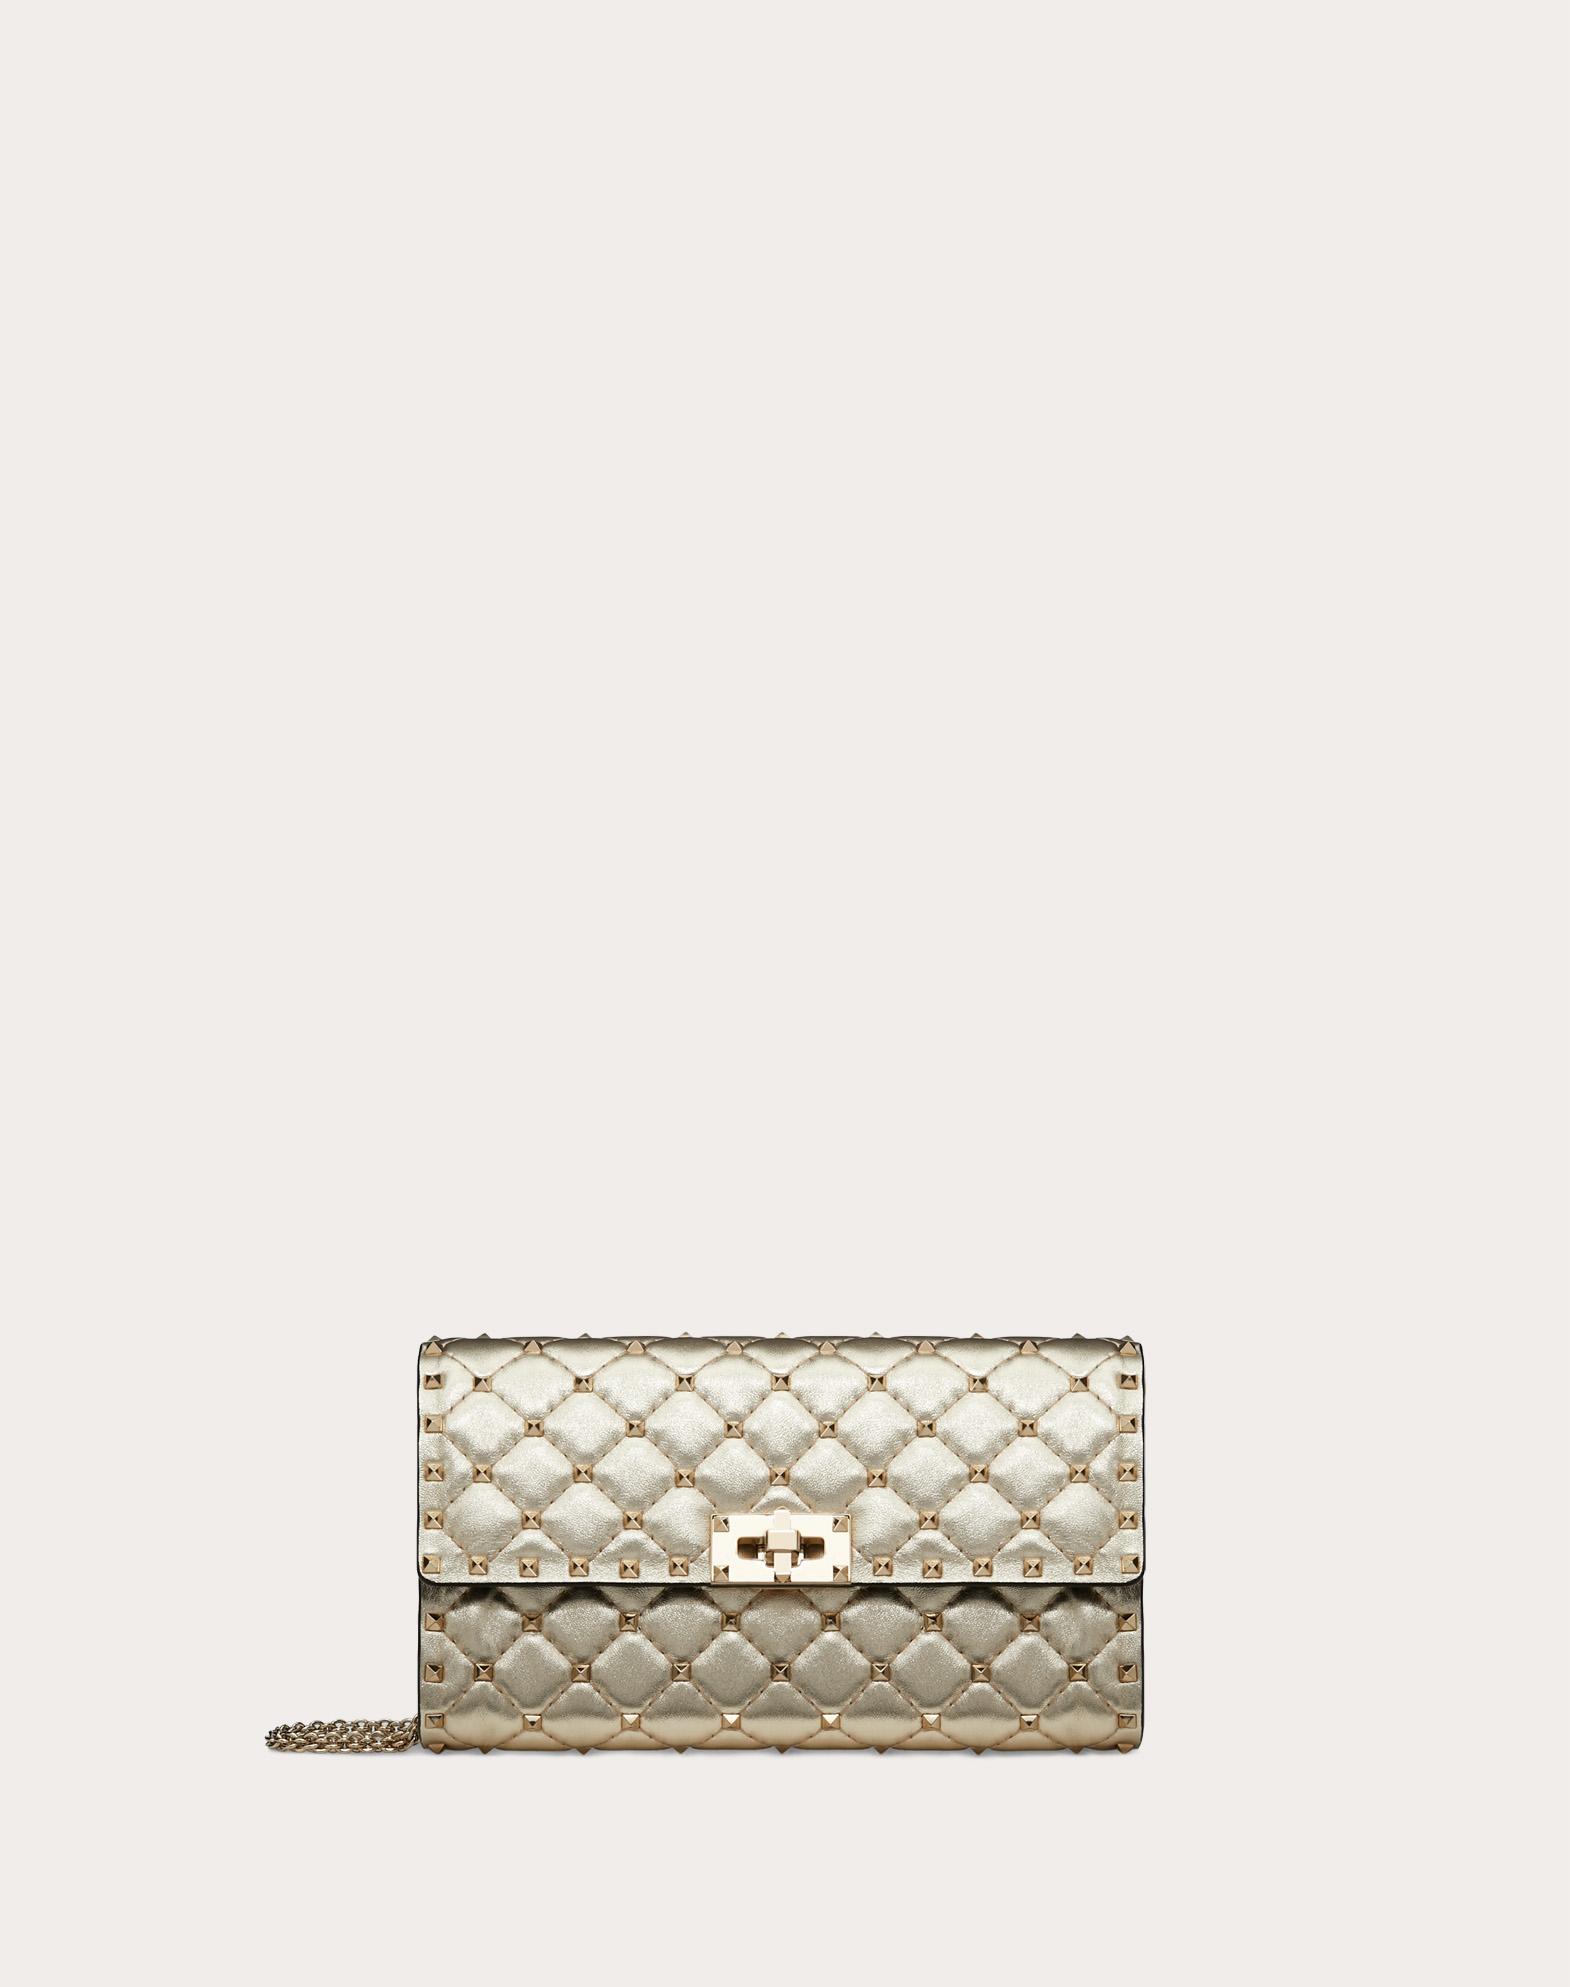 Rockstud Spike Crossbody Clutch Bag